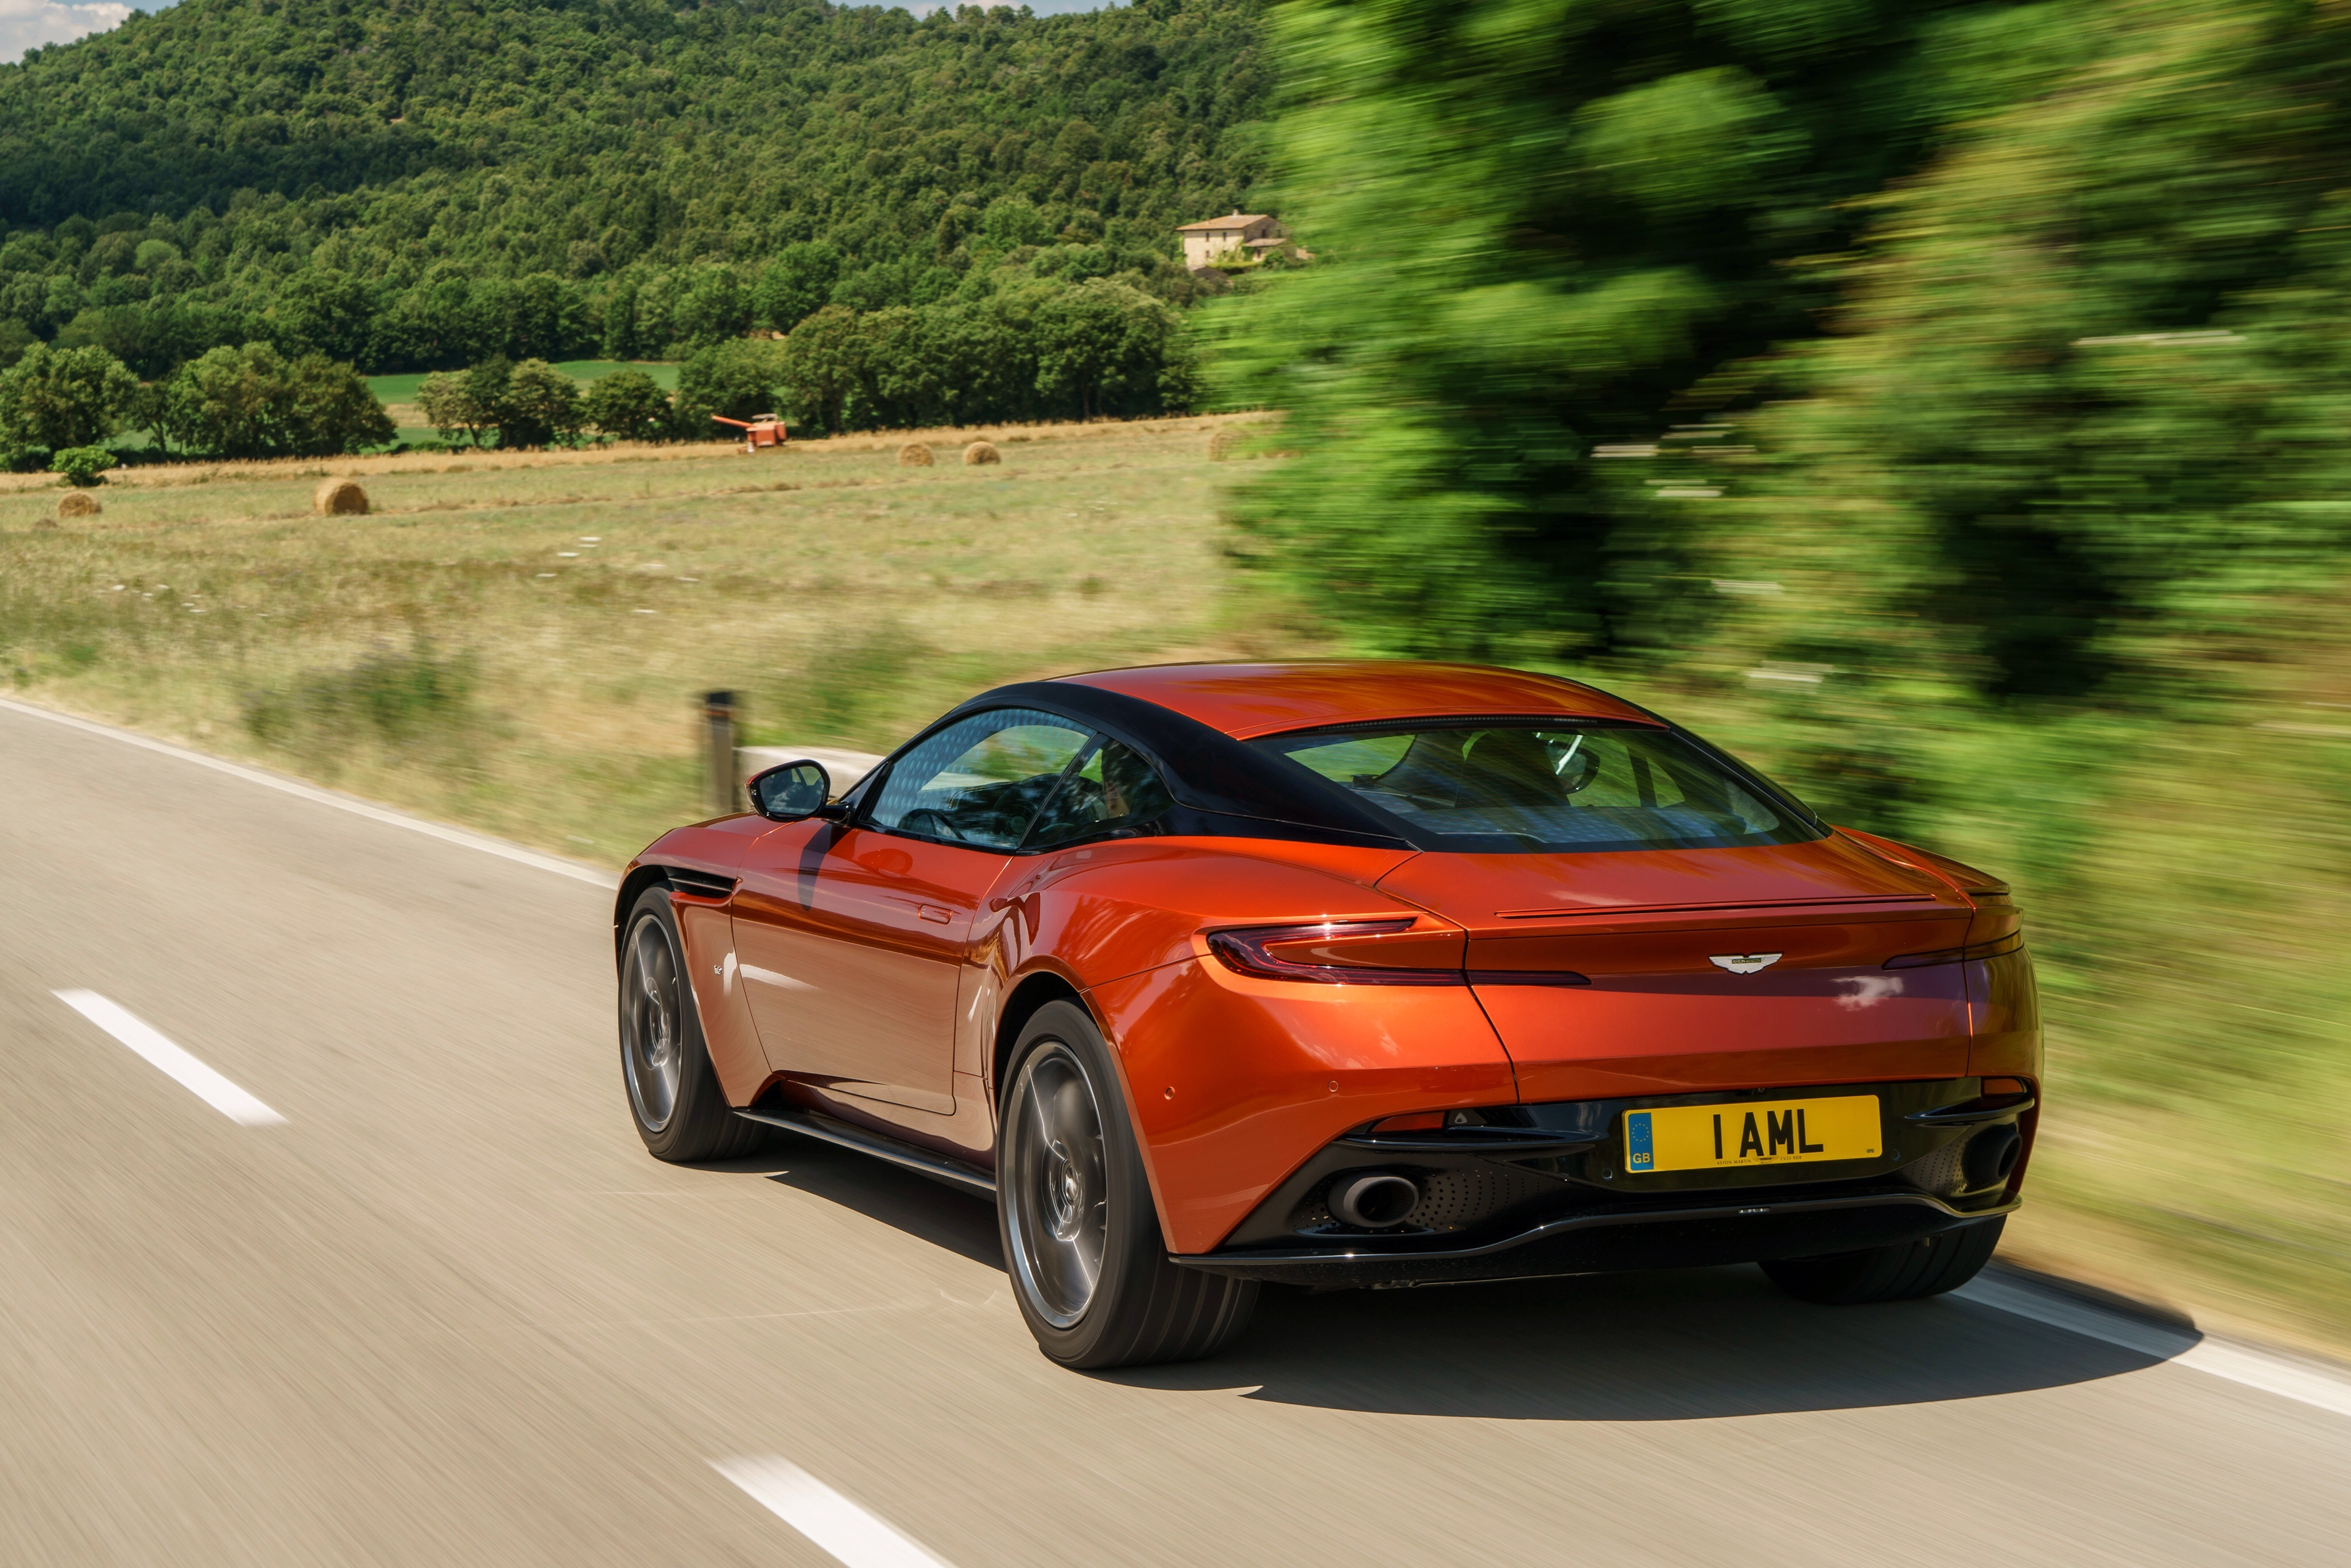 117947 Заставки и Обои Астон Мартин (Aston Martin) на телефон. Скачать Астон Мартин (Aston Martin), Тачки (Cars), Красный, Вид Сбоку, Db11 картинки бесплатно